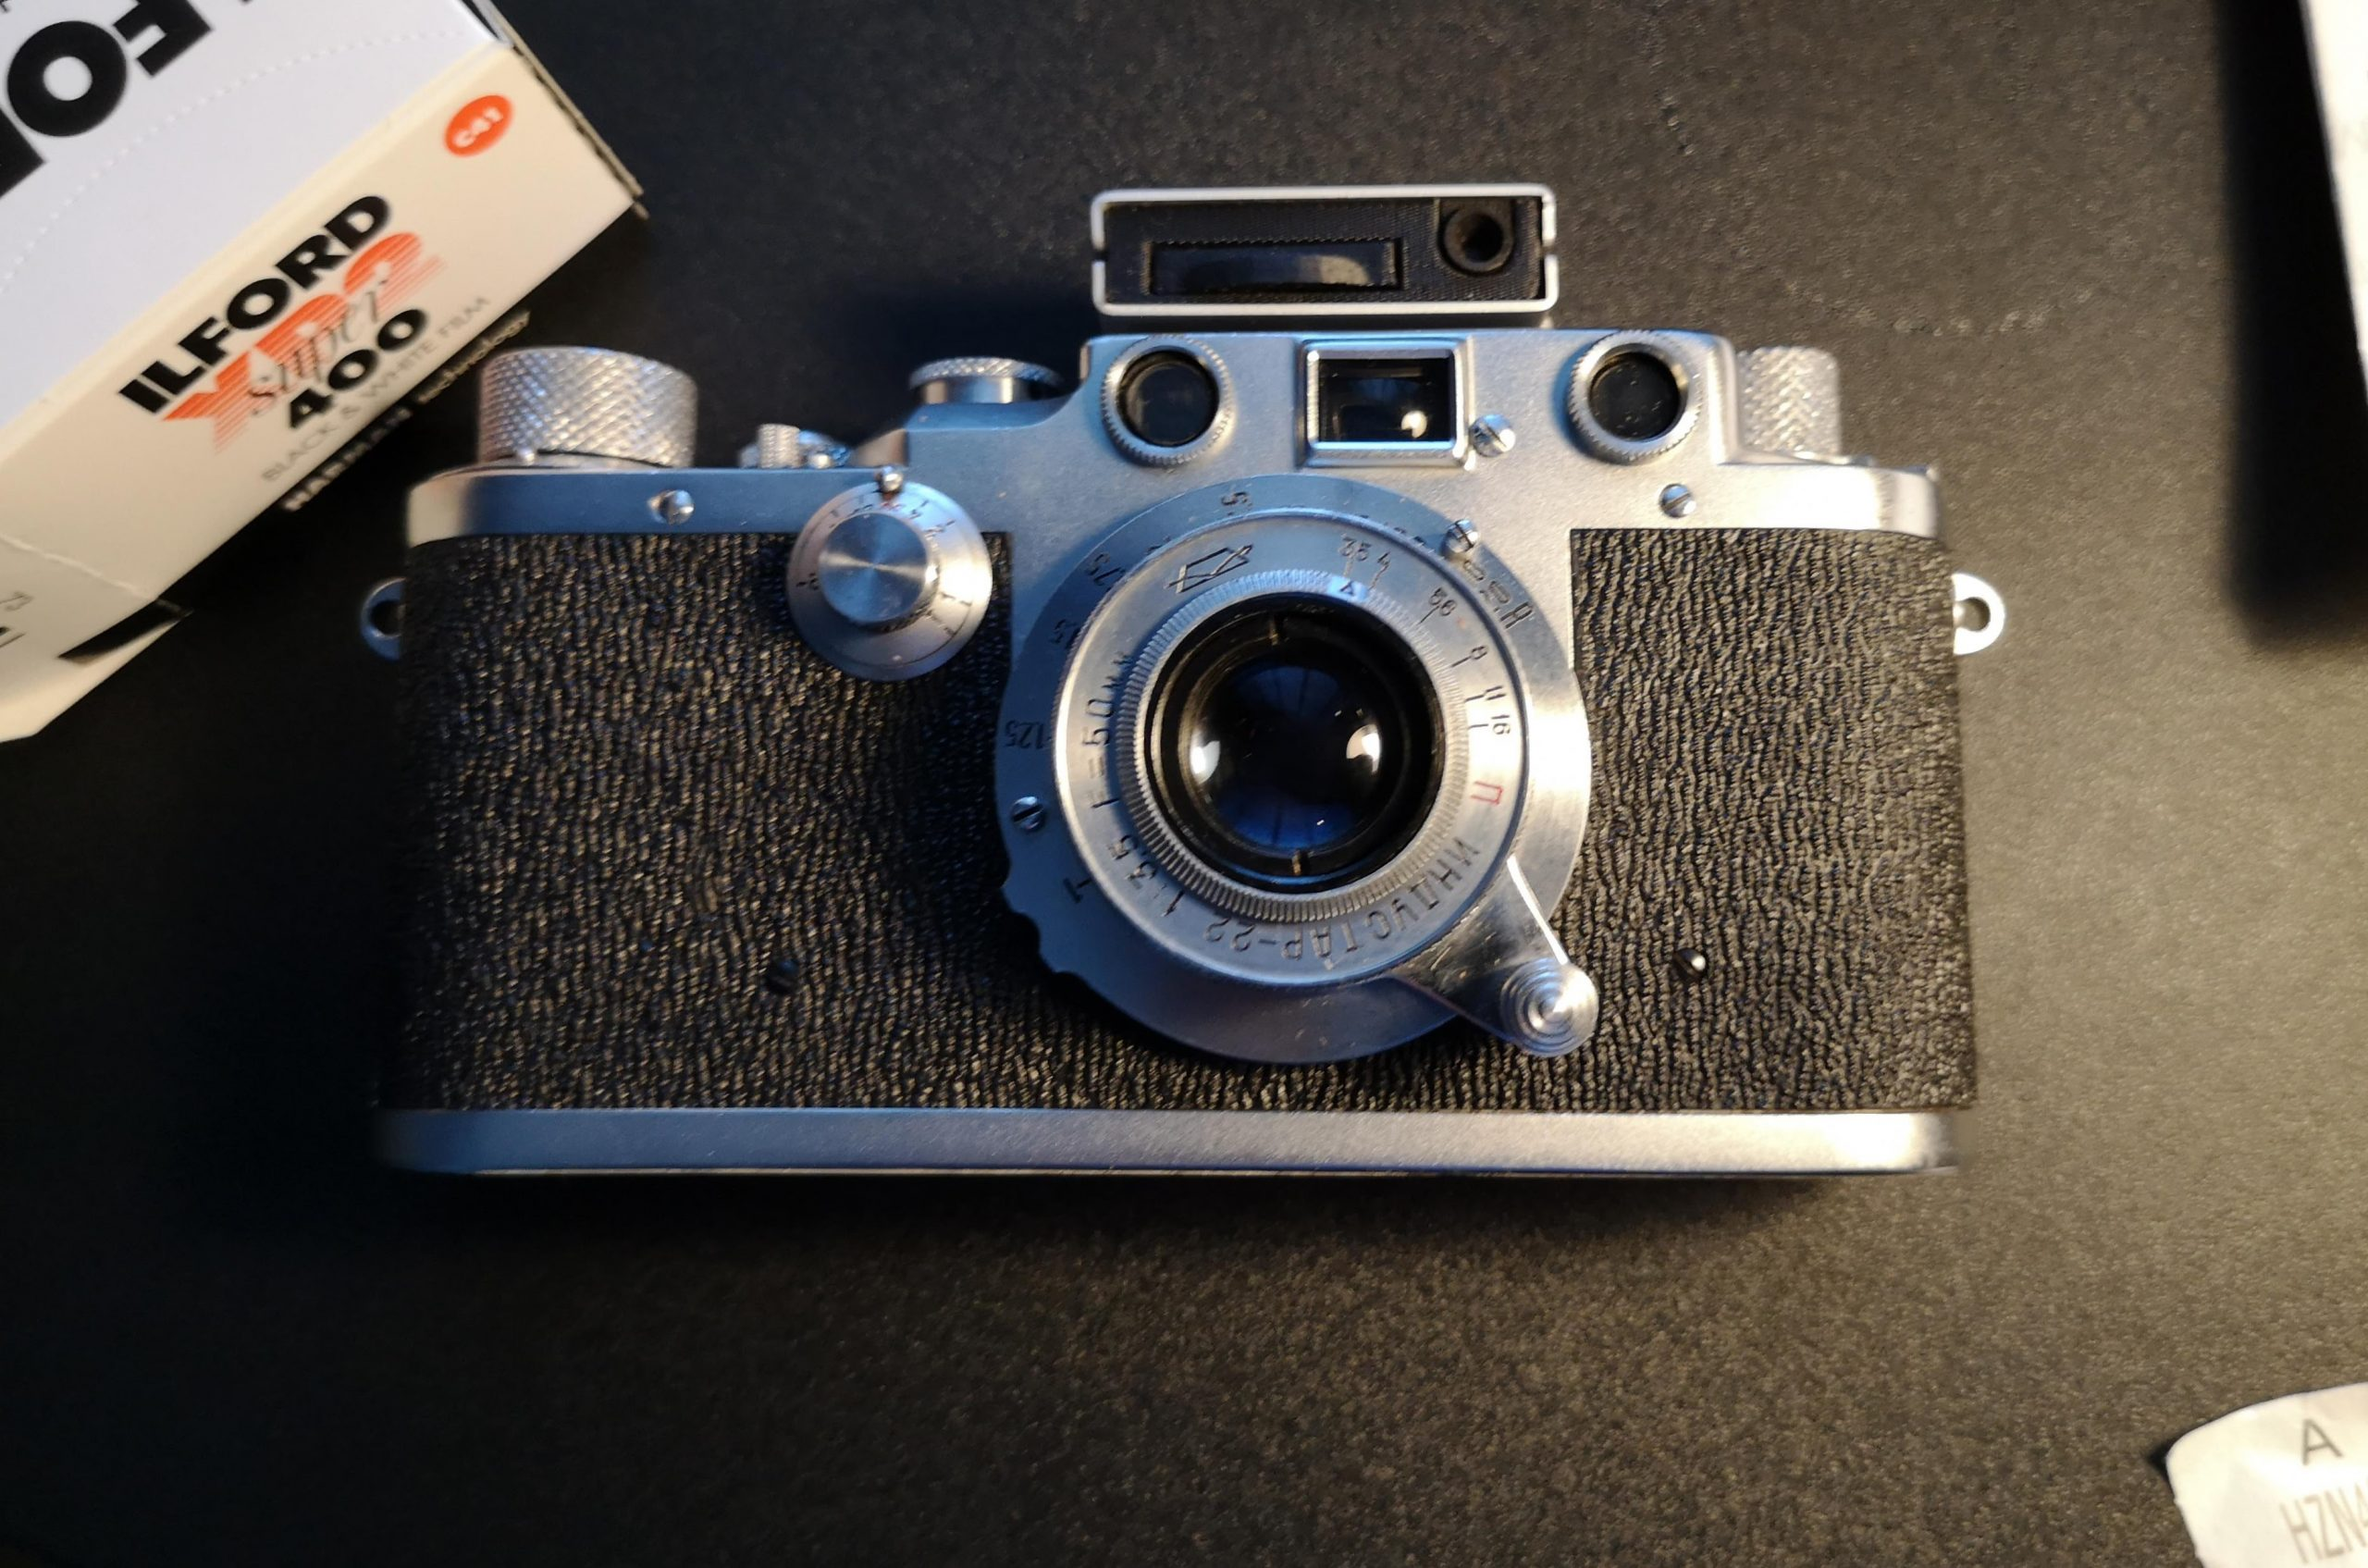 Hedeco Lime One mounted on a Leica IIIc